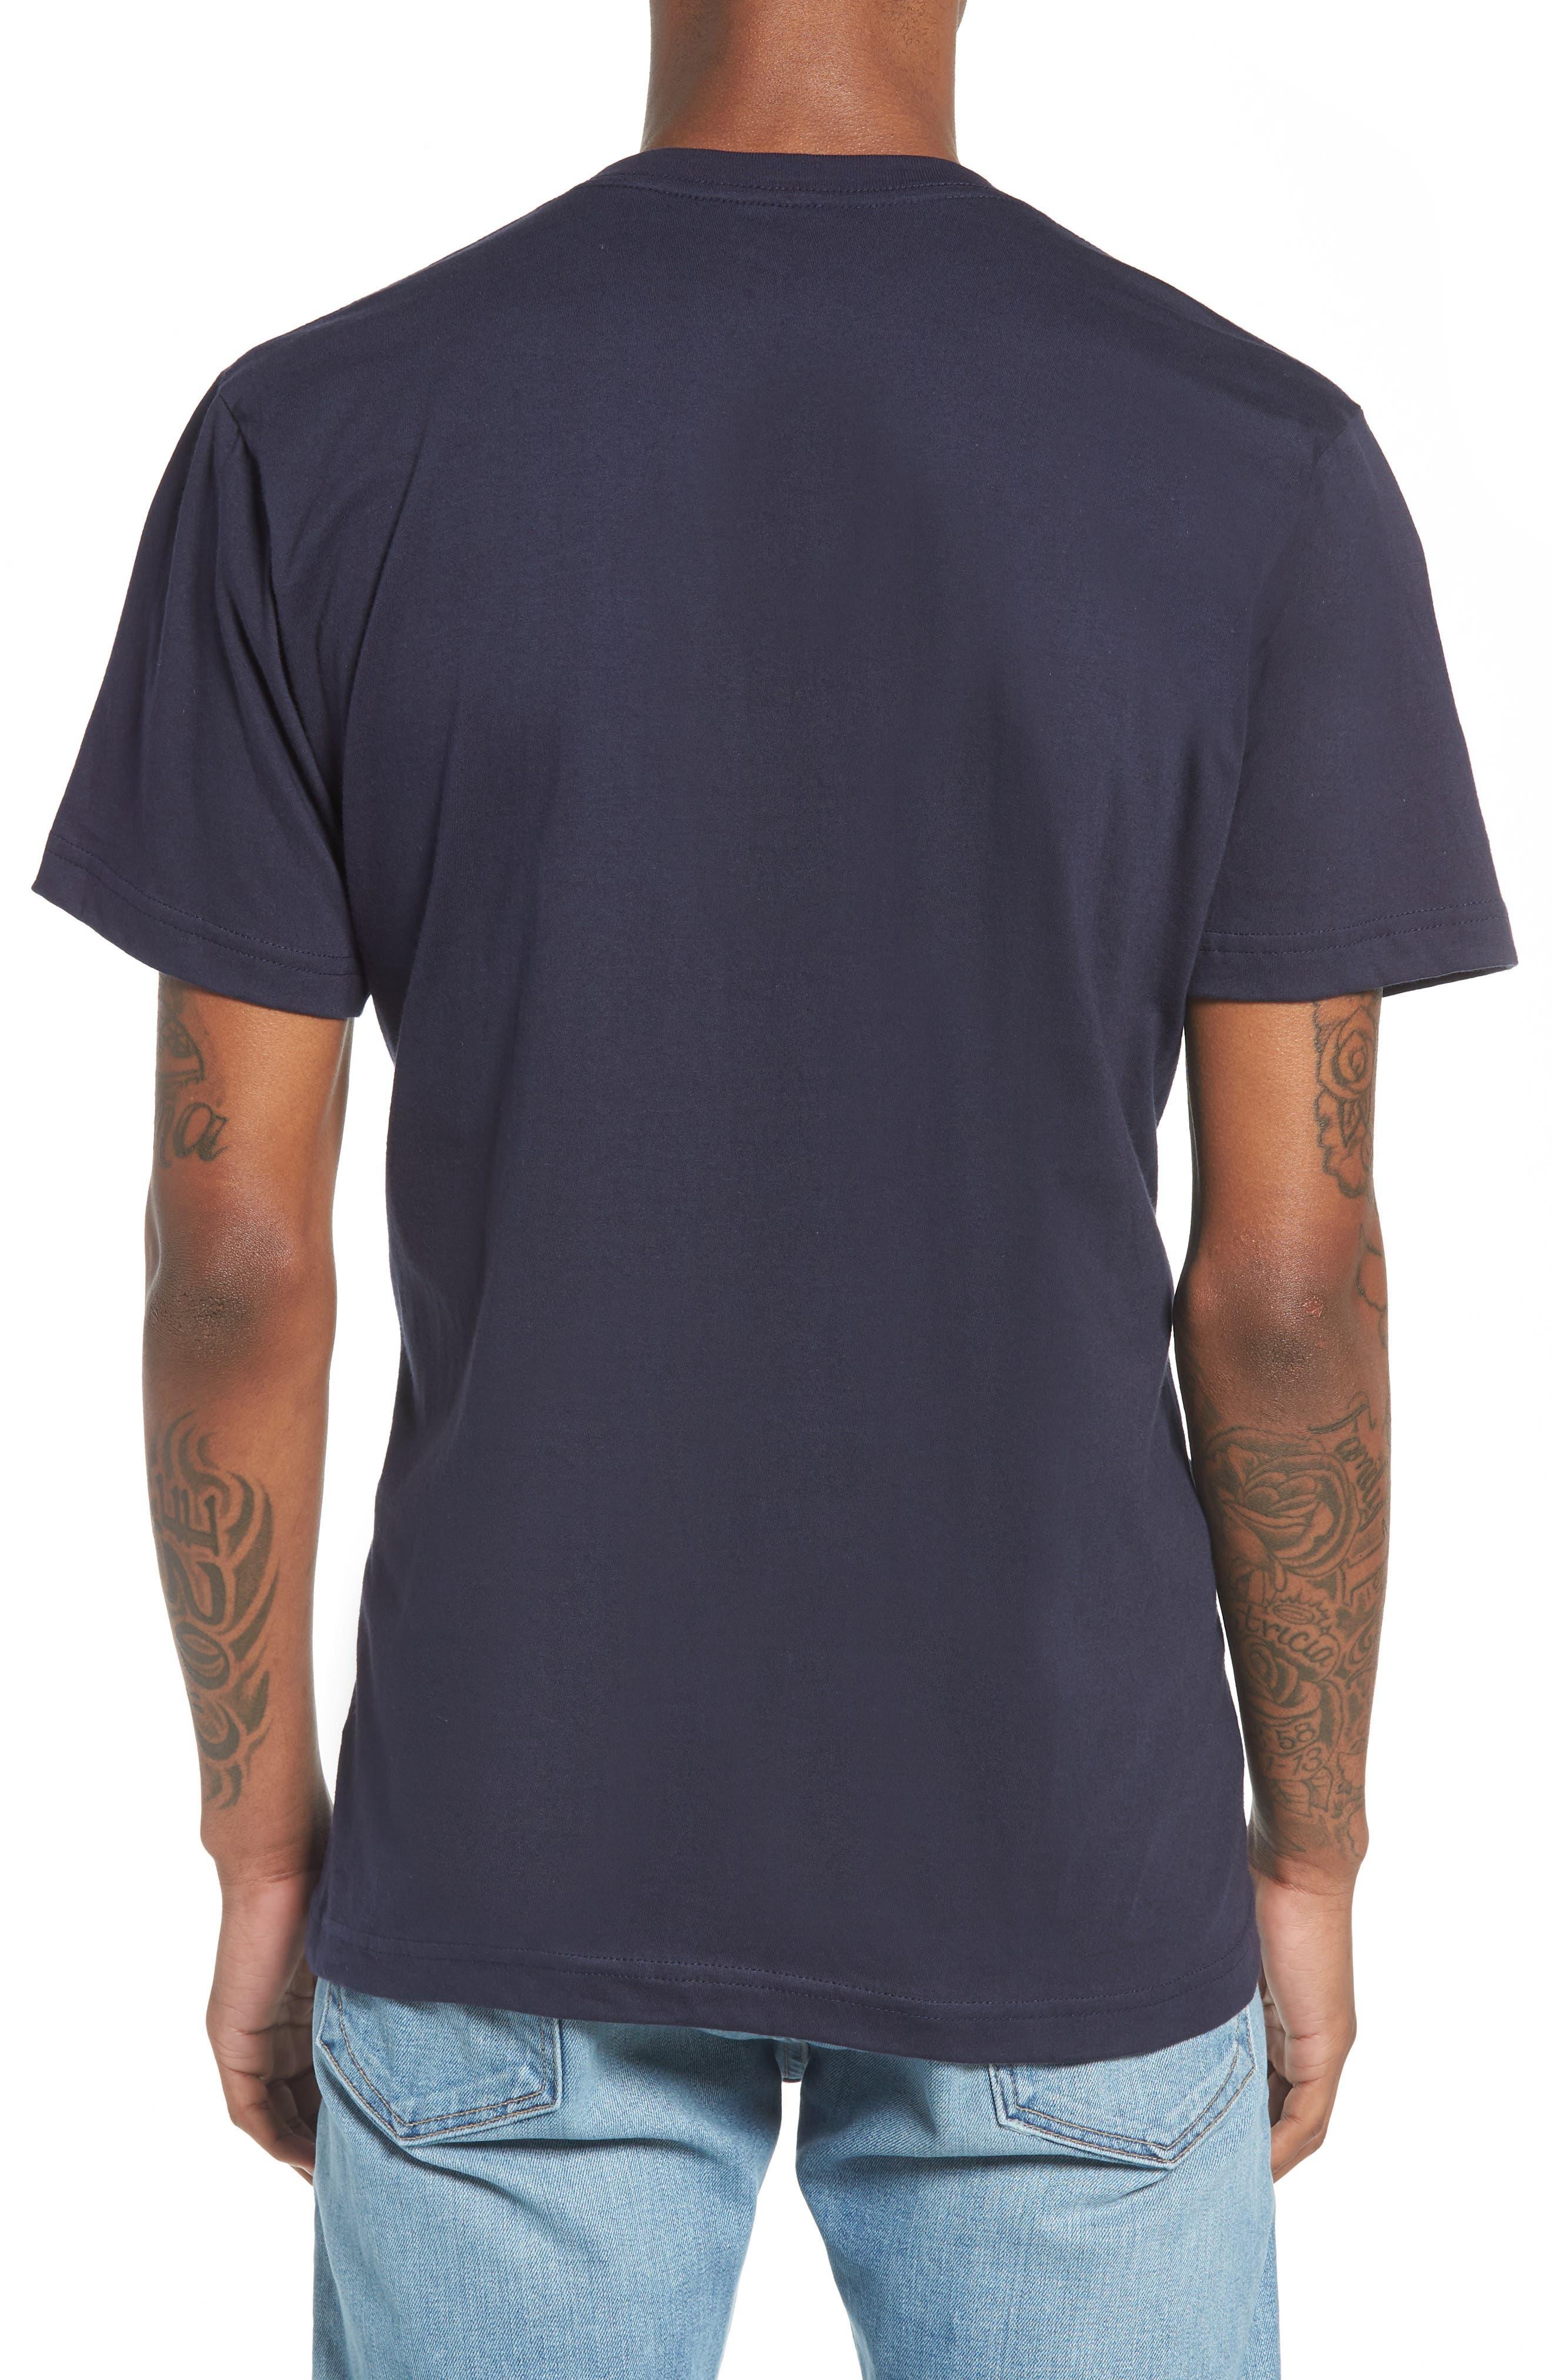 Brooklyn Bridge Graphic T-Shirt,                             Alternate thumbnail 2, color,                             Navy